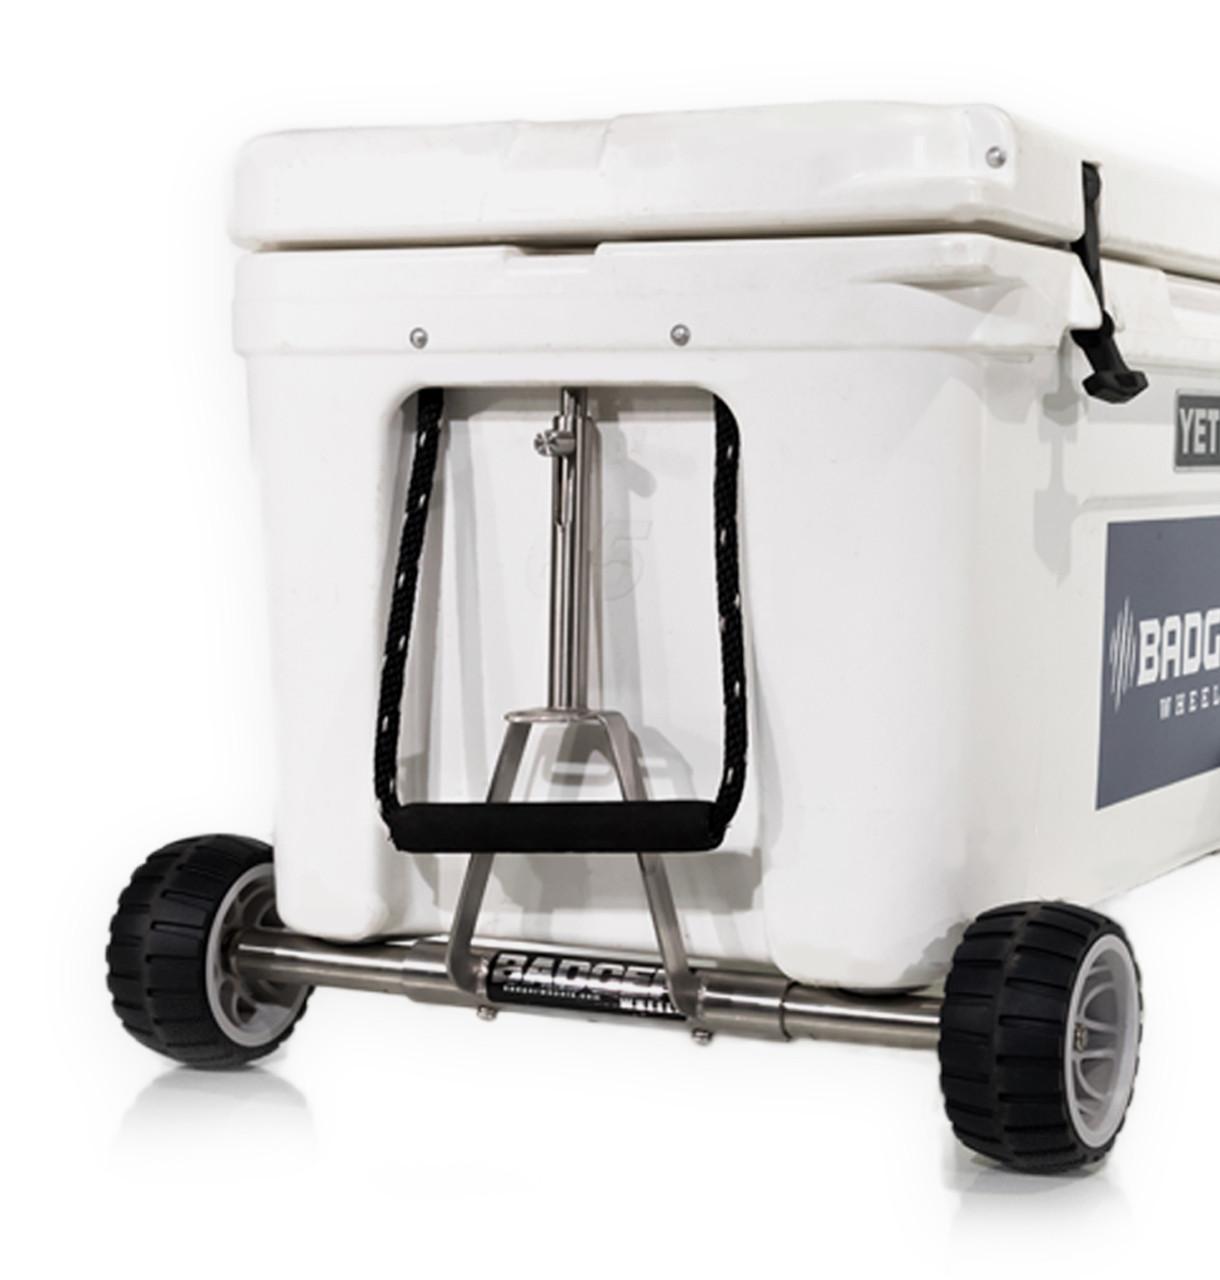 Standard Wheel Original Badger Wheels™ - Single Axle (Fits Tundra  35-45-50-65-75-105-110-125-160)